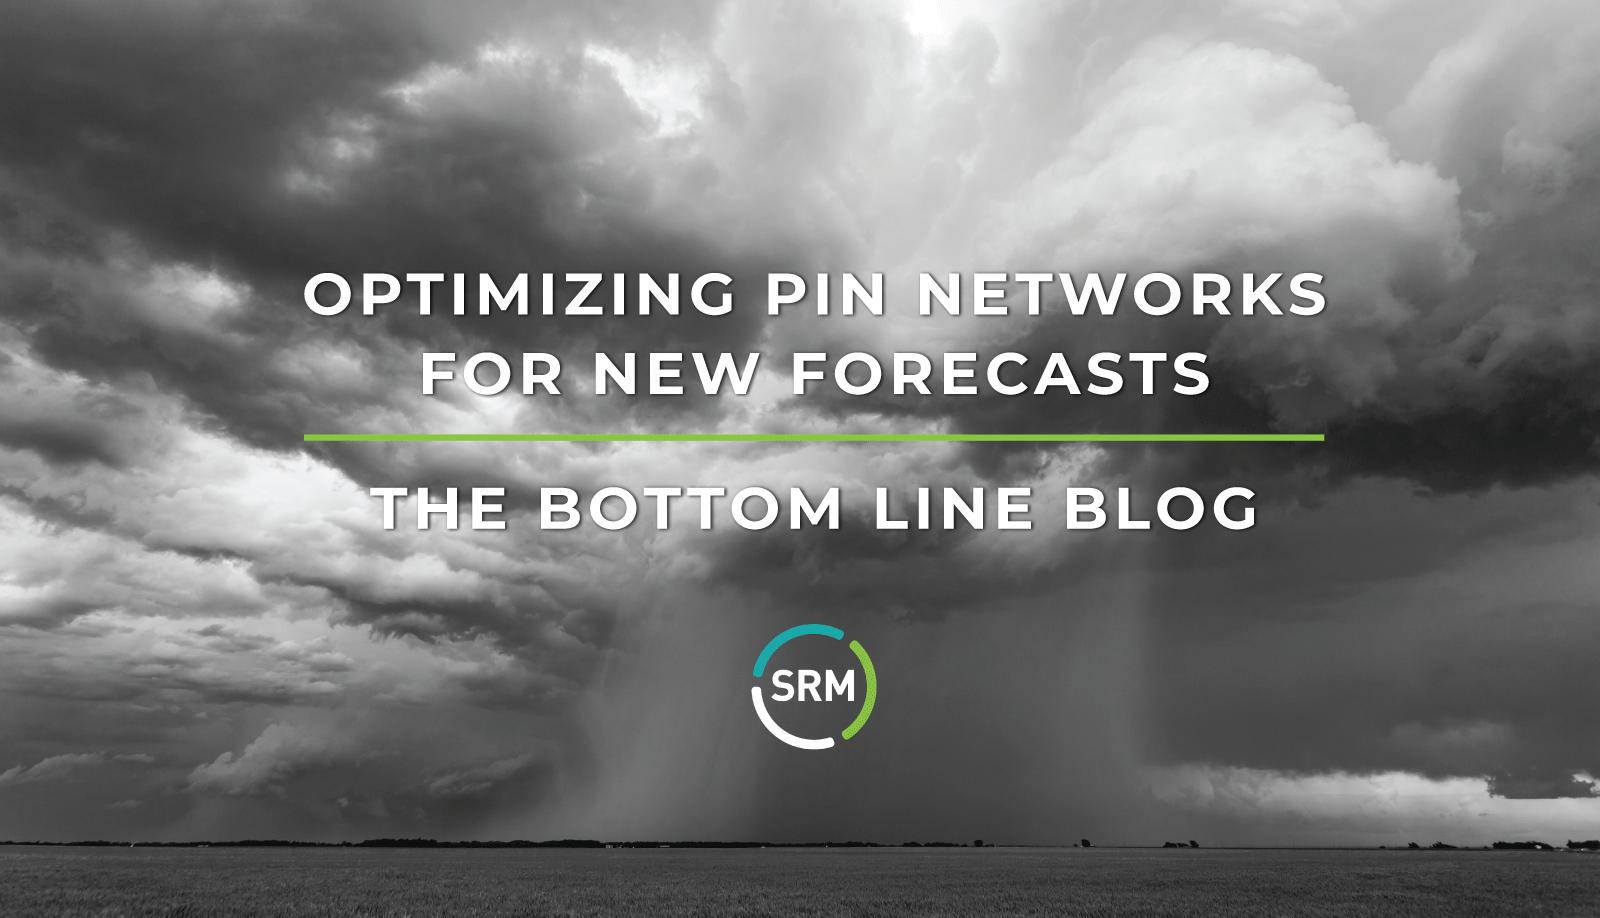 PINOptimizationBlog